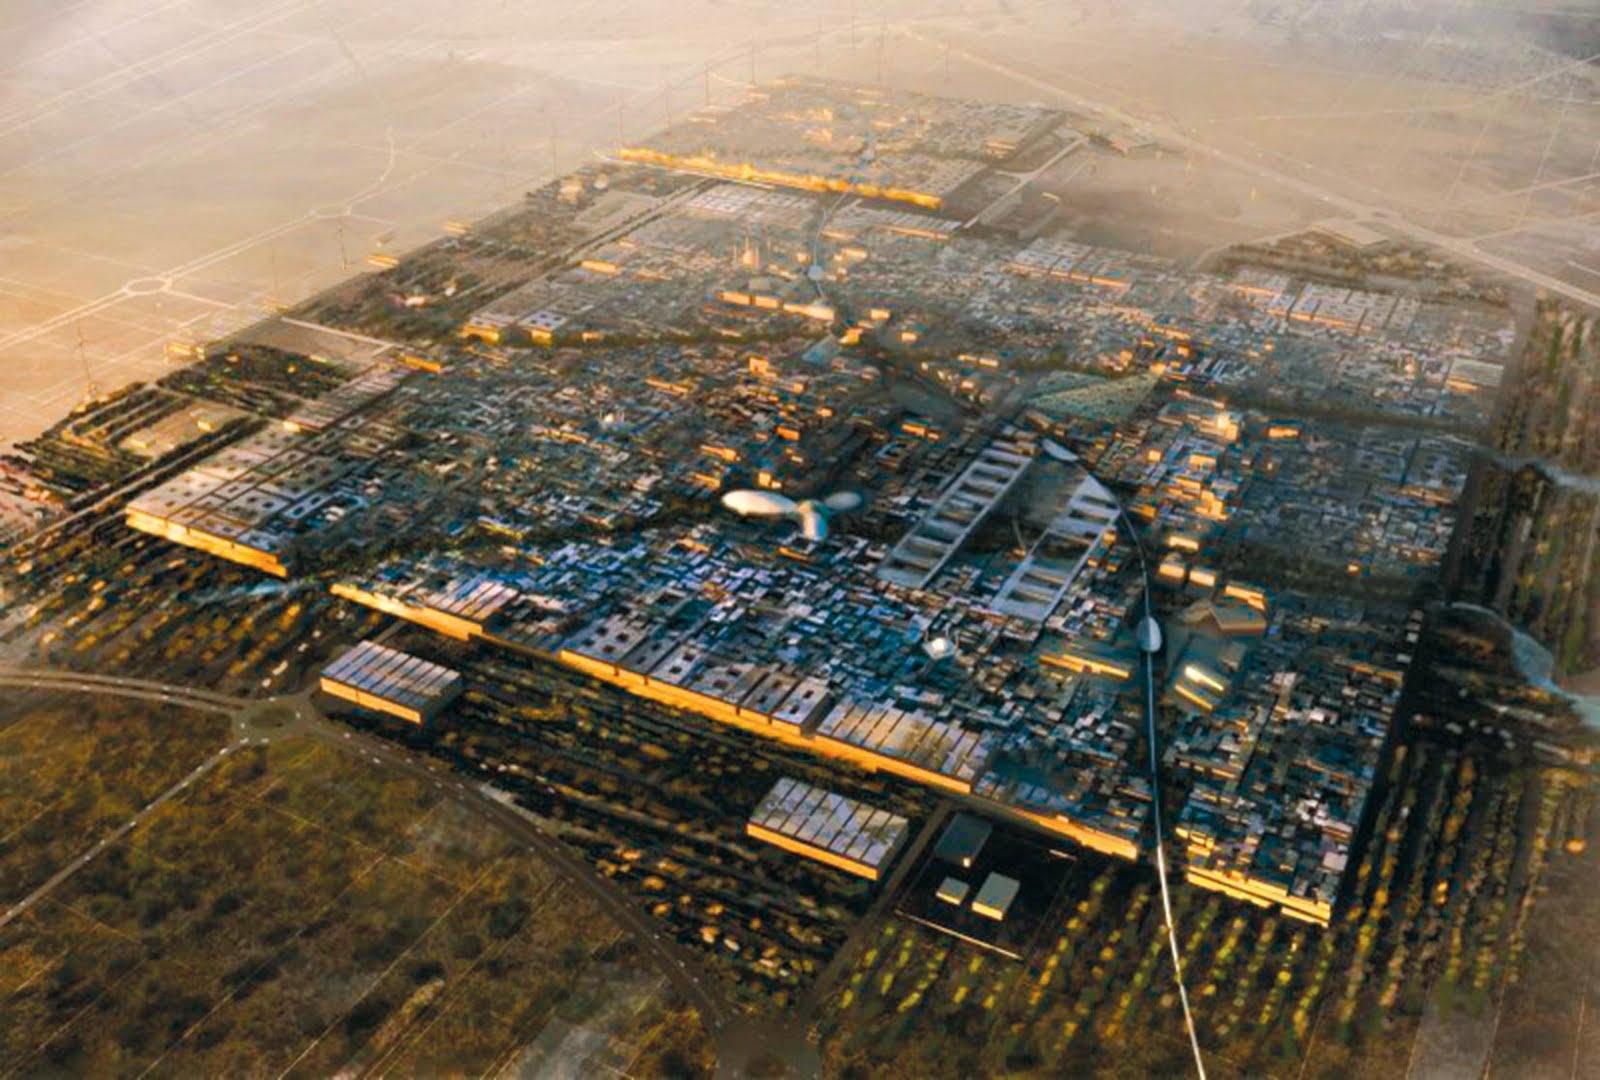 masdar+city+foster+01_ordenaci%C3%B3n